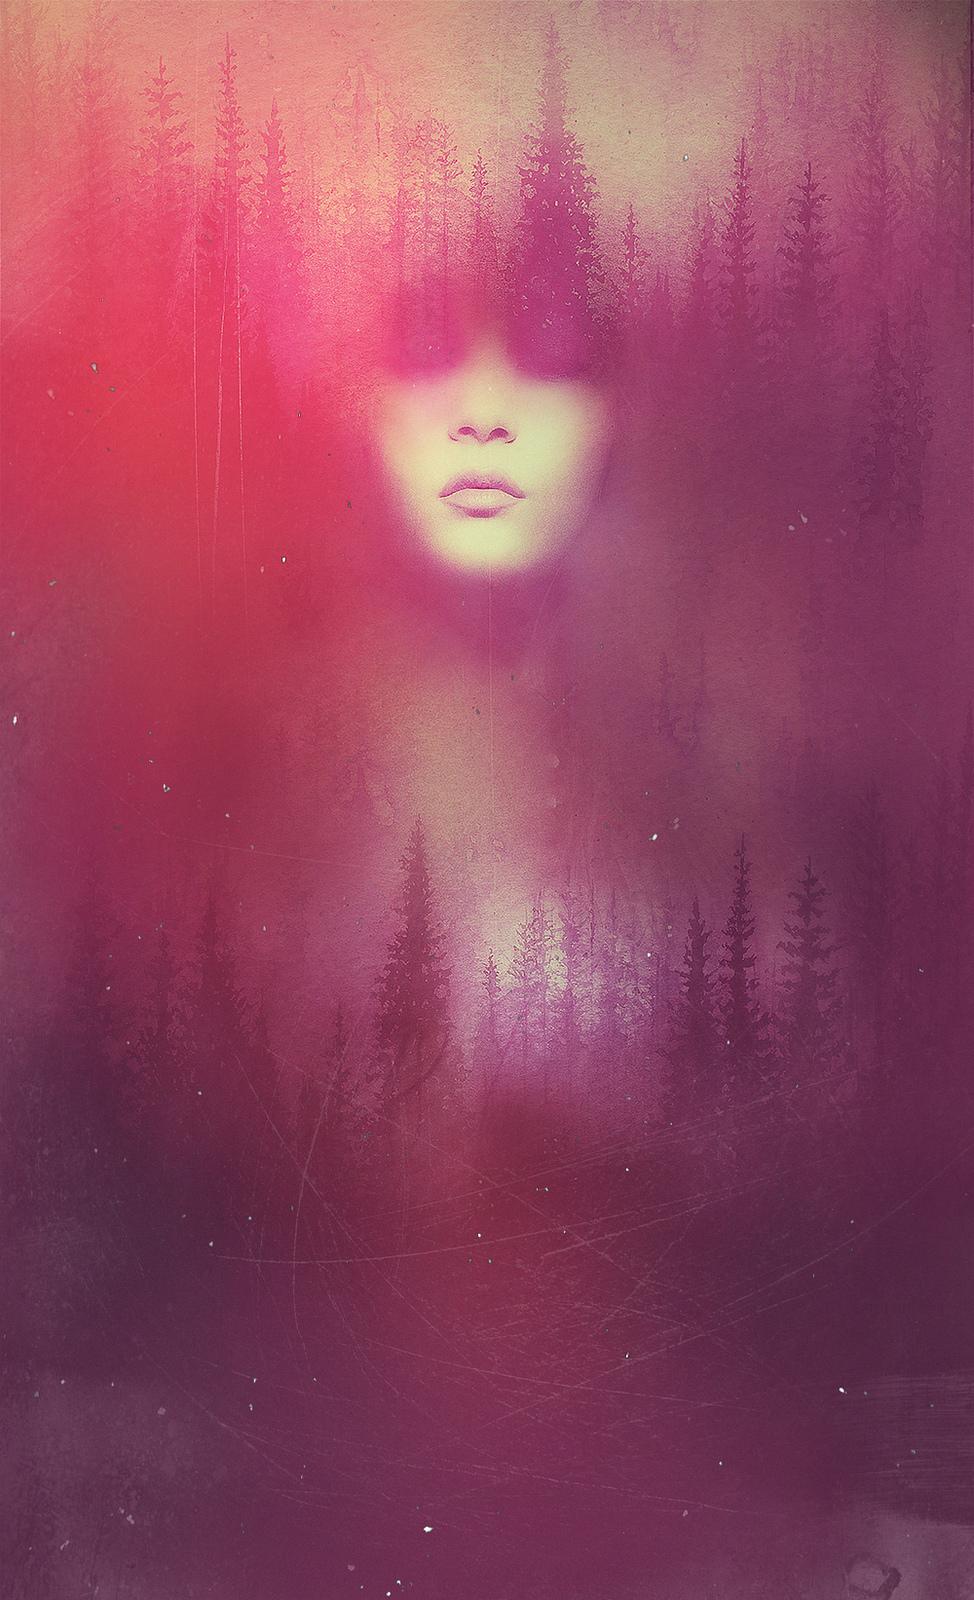 Federico Bebber – My Head Is Slowly Exploding – Digital art